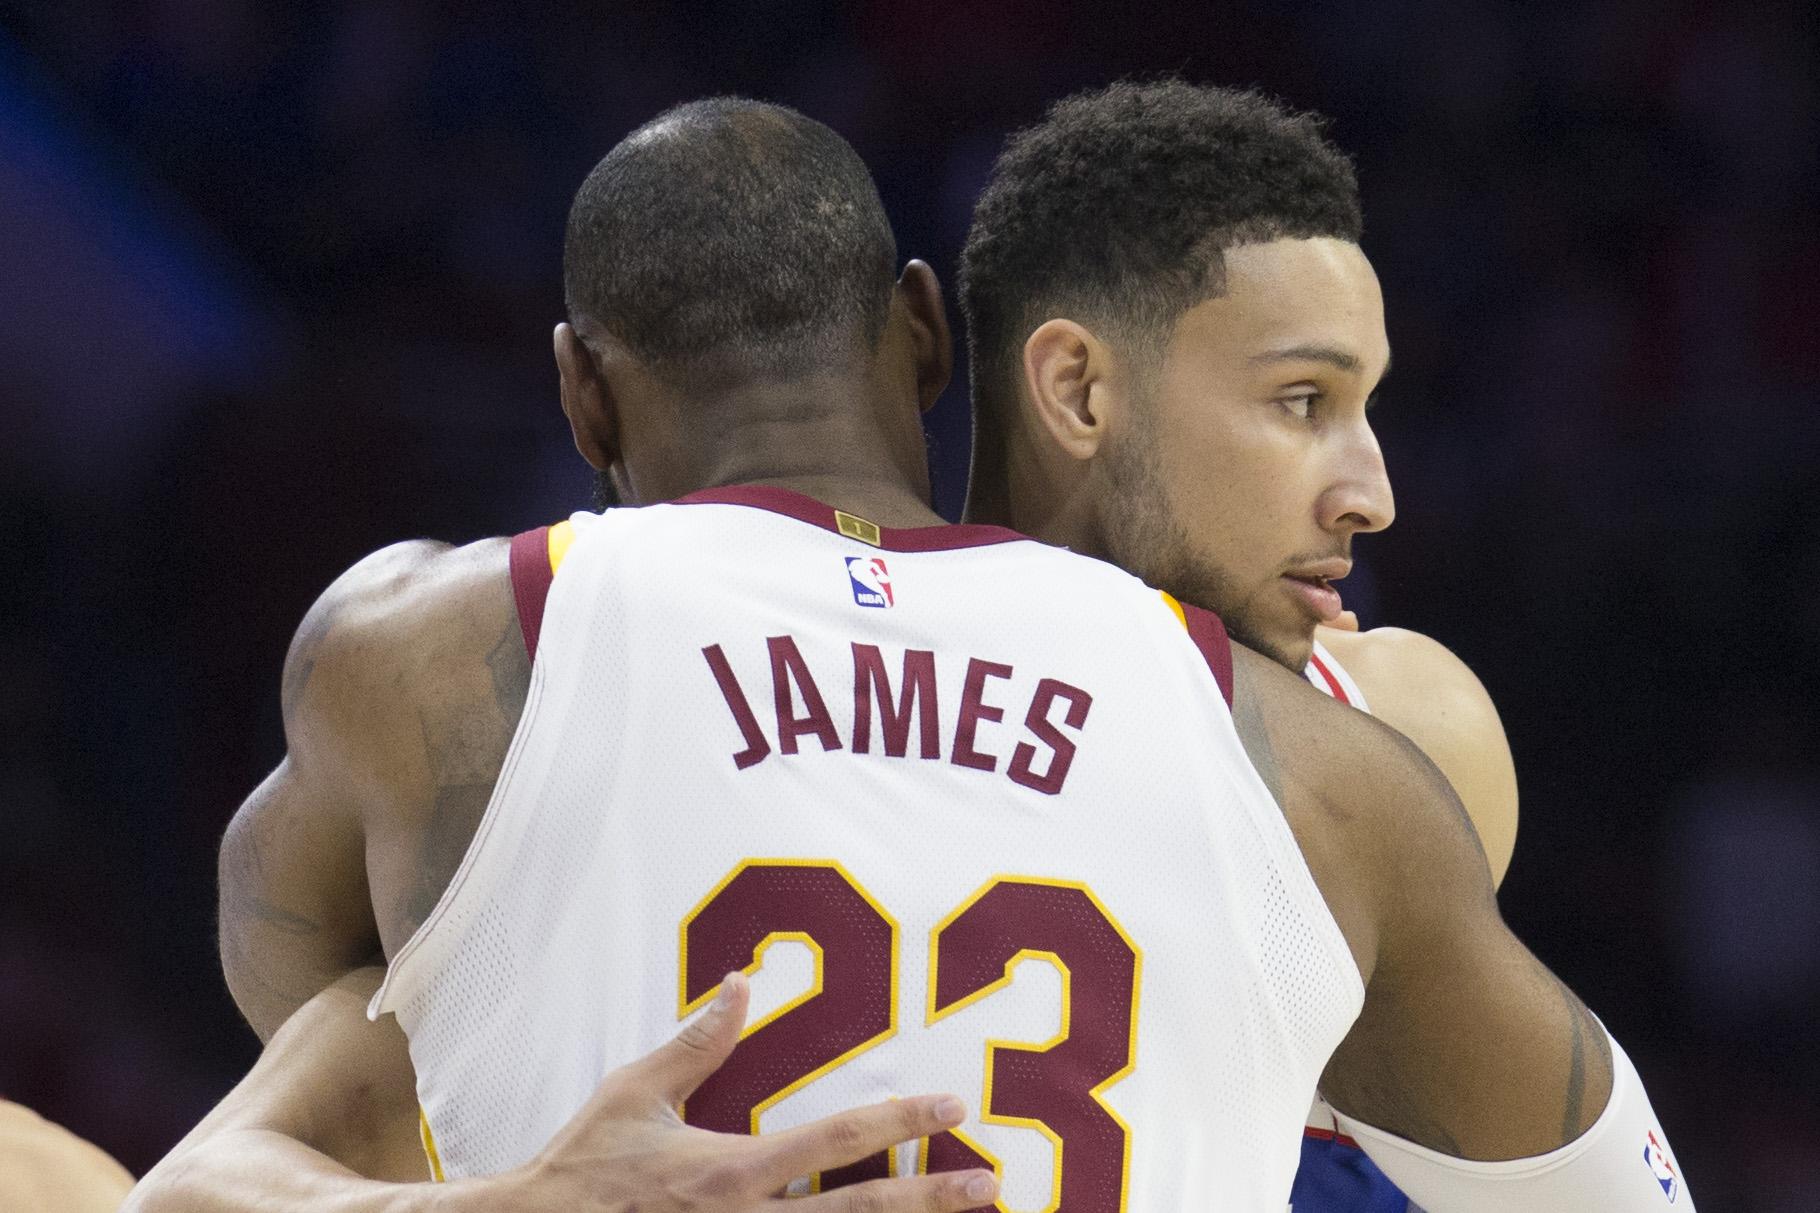 LA Lawyer Puts Up Billboards to Recruit LeBron James